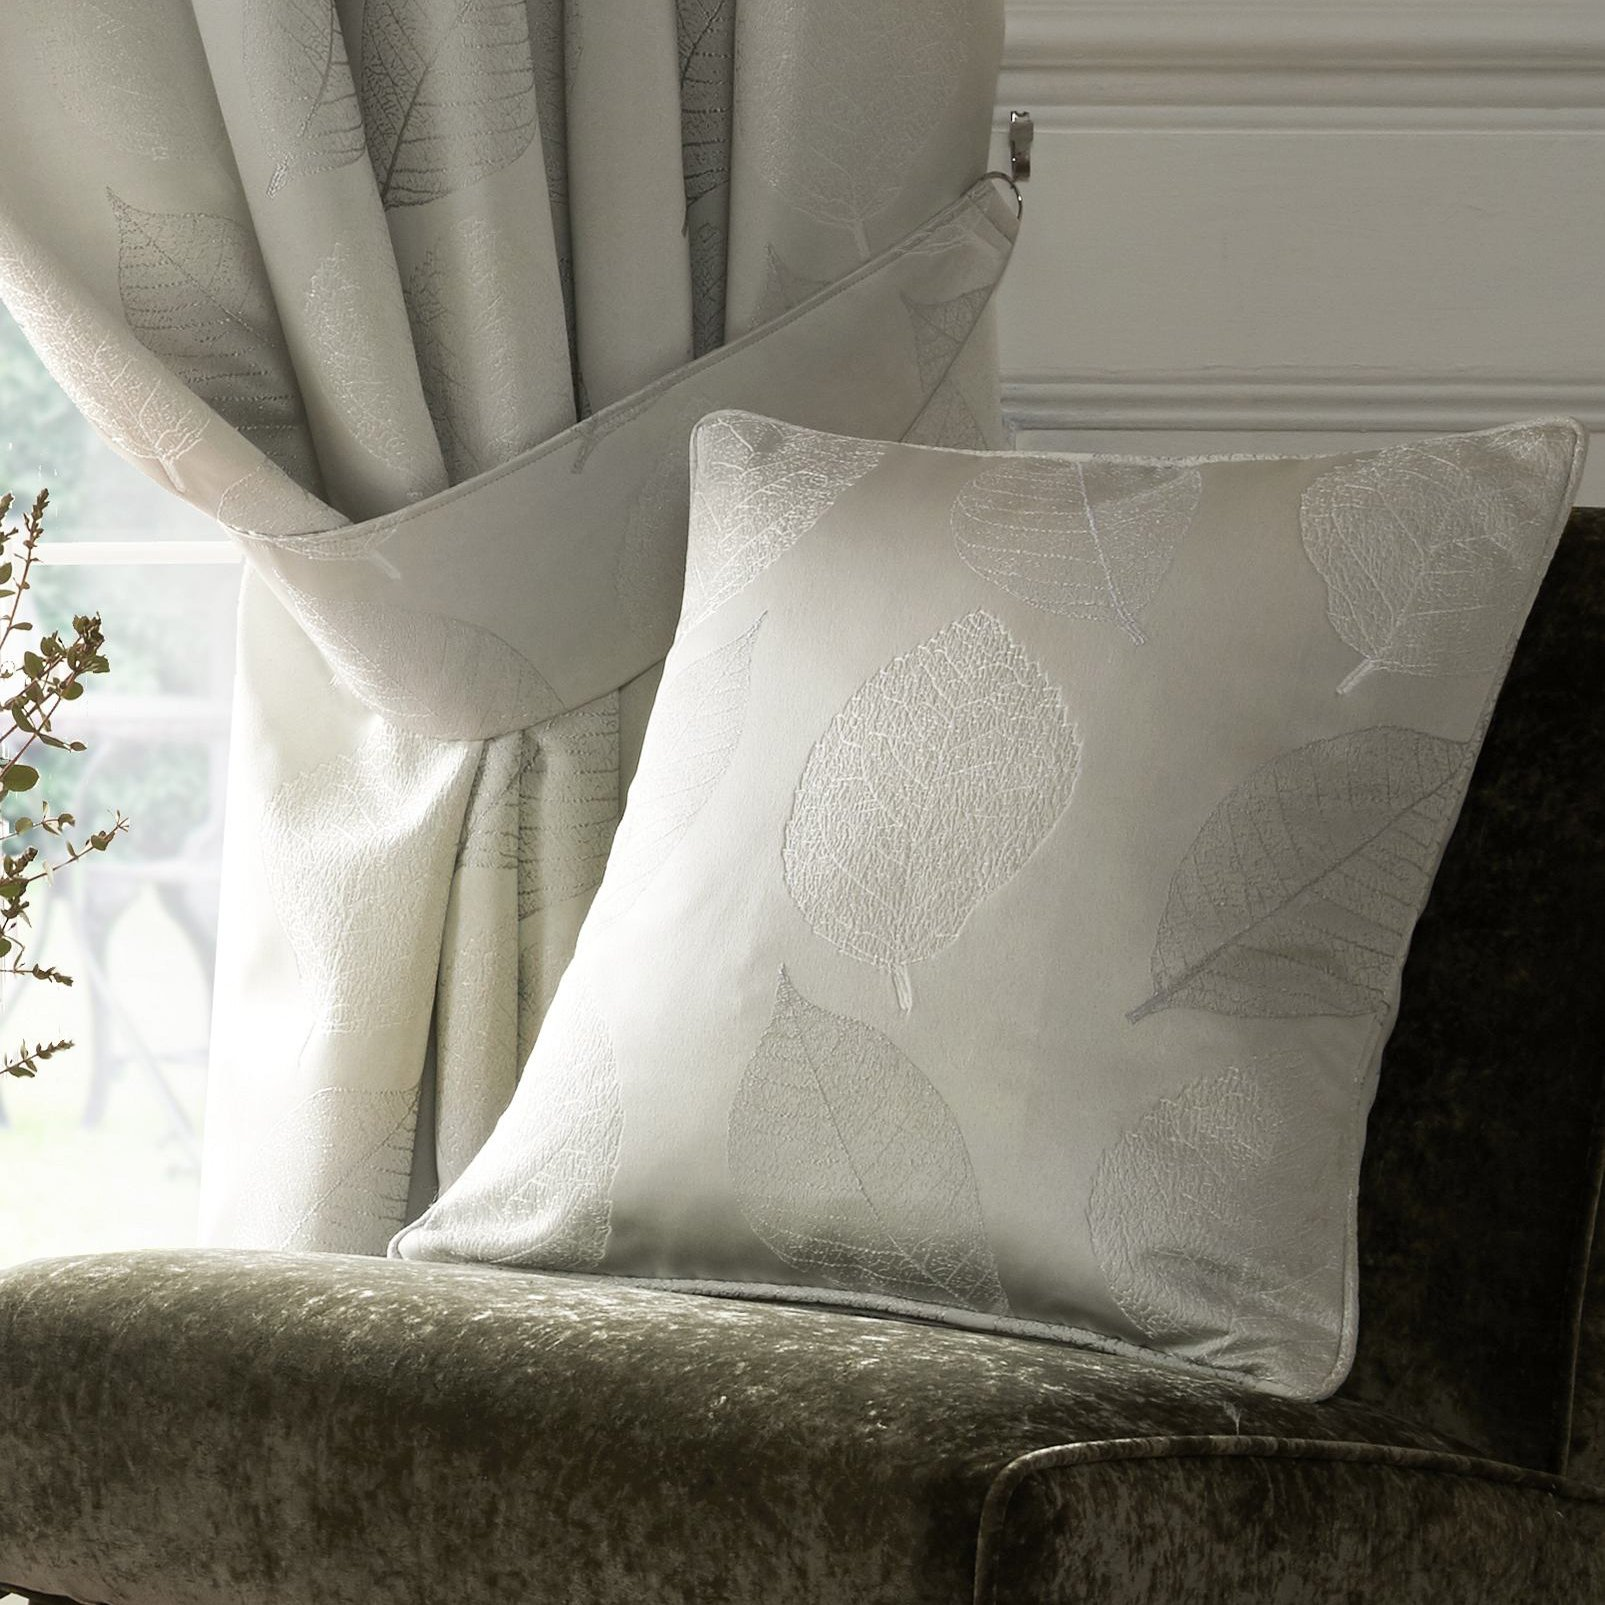 Village-fabrics-Curtains-Ashwell-Silver-Tiebacks-and-Cushion